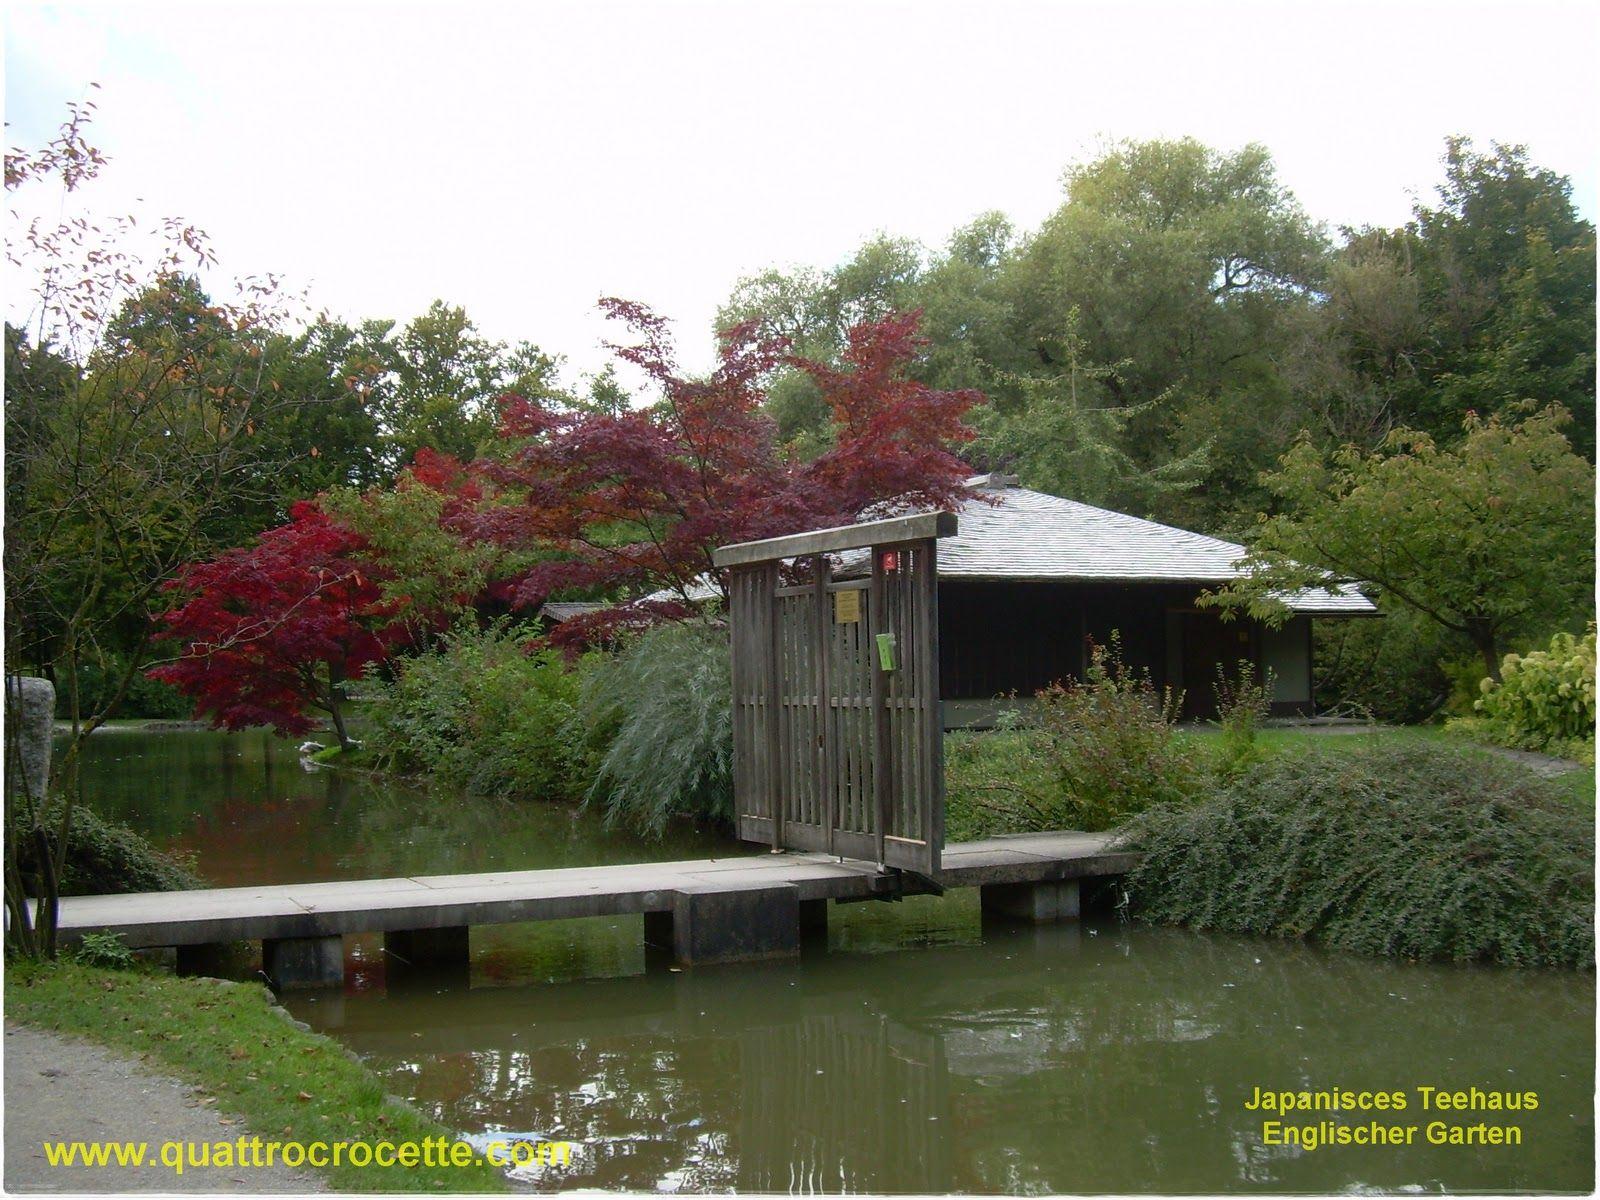 Munchen - Japanisces Teehaus (Englischer Garten)